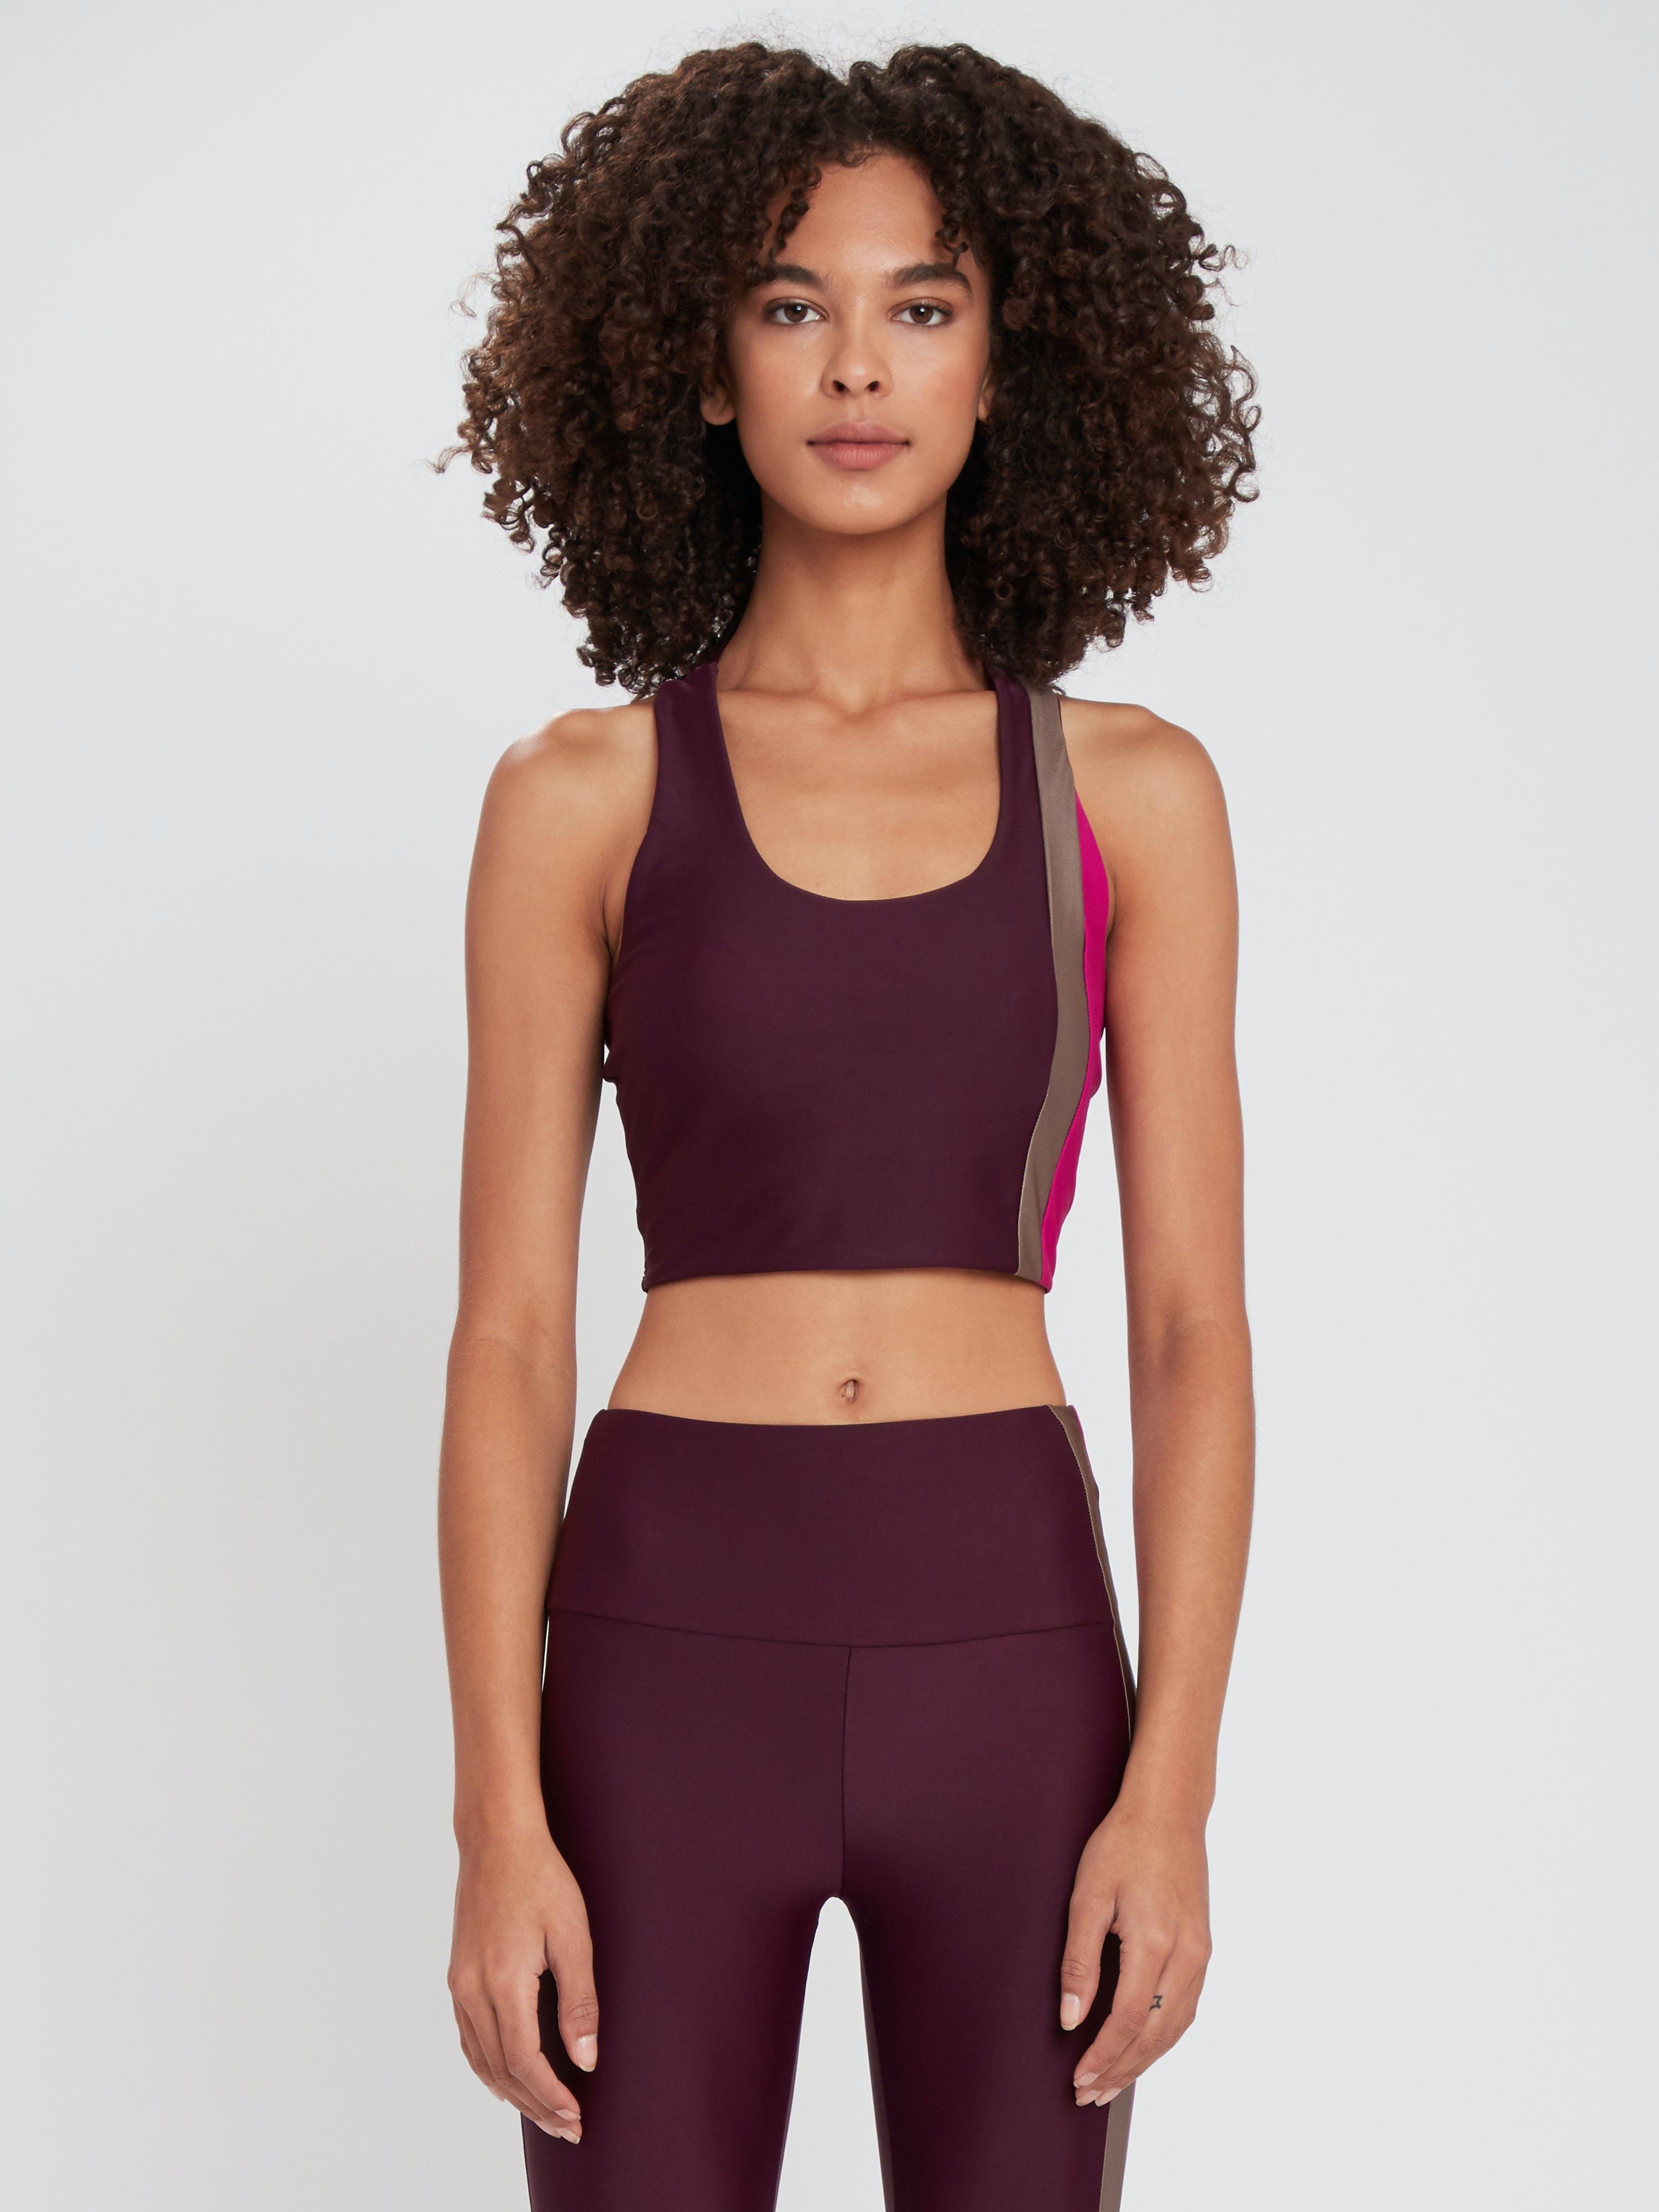 Lanston Sport Strive Striped Longline Bra - M - Also in: L, S  - Pink